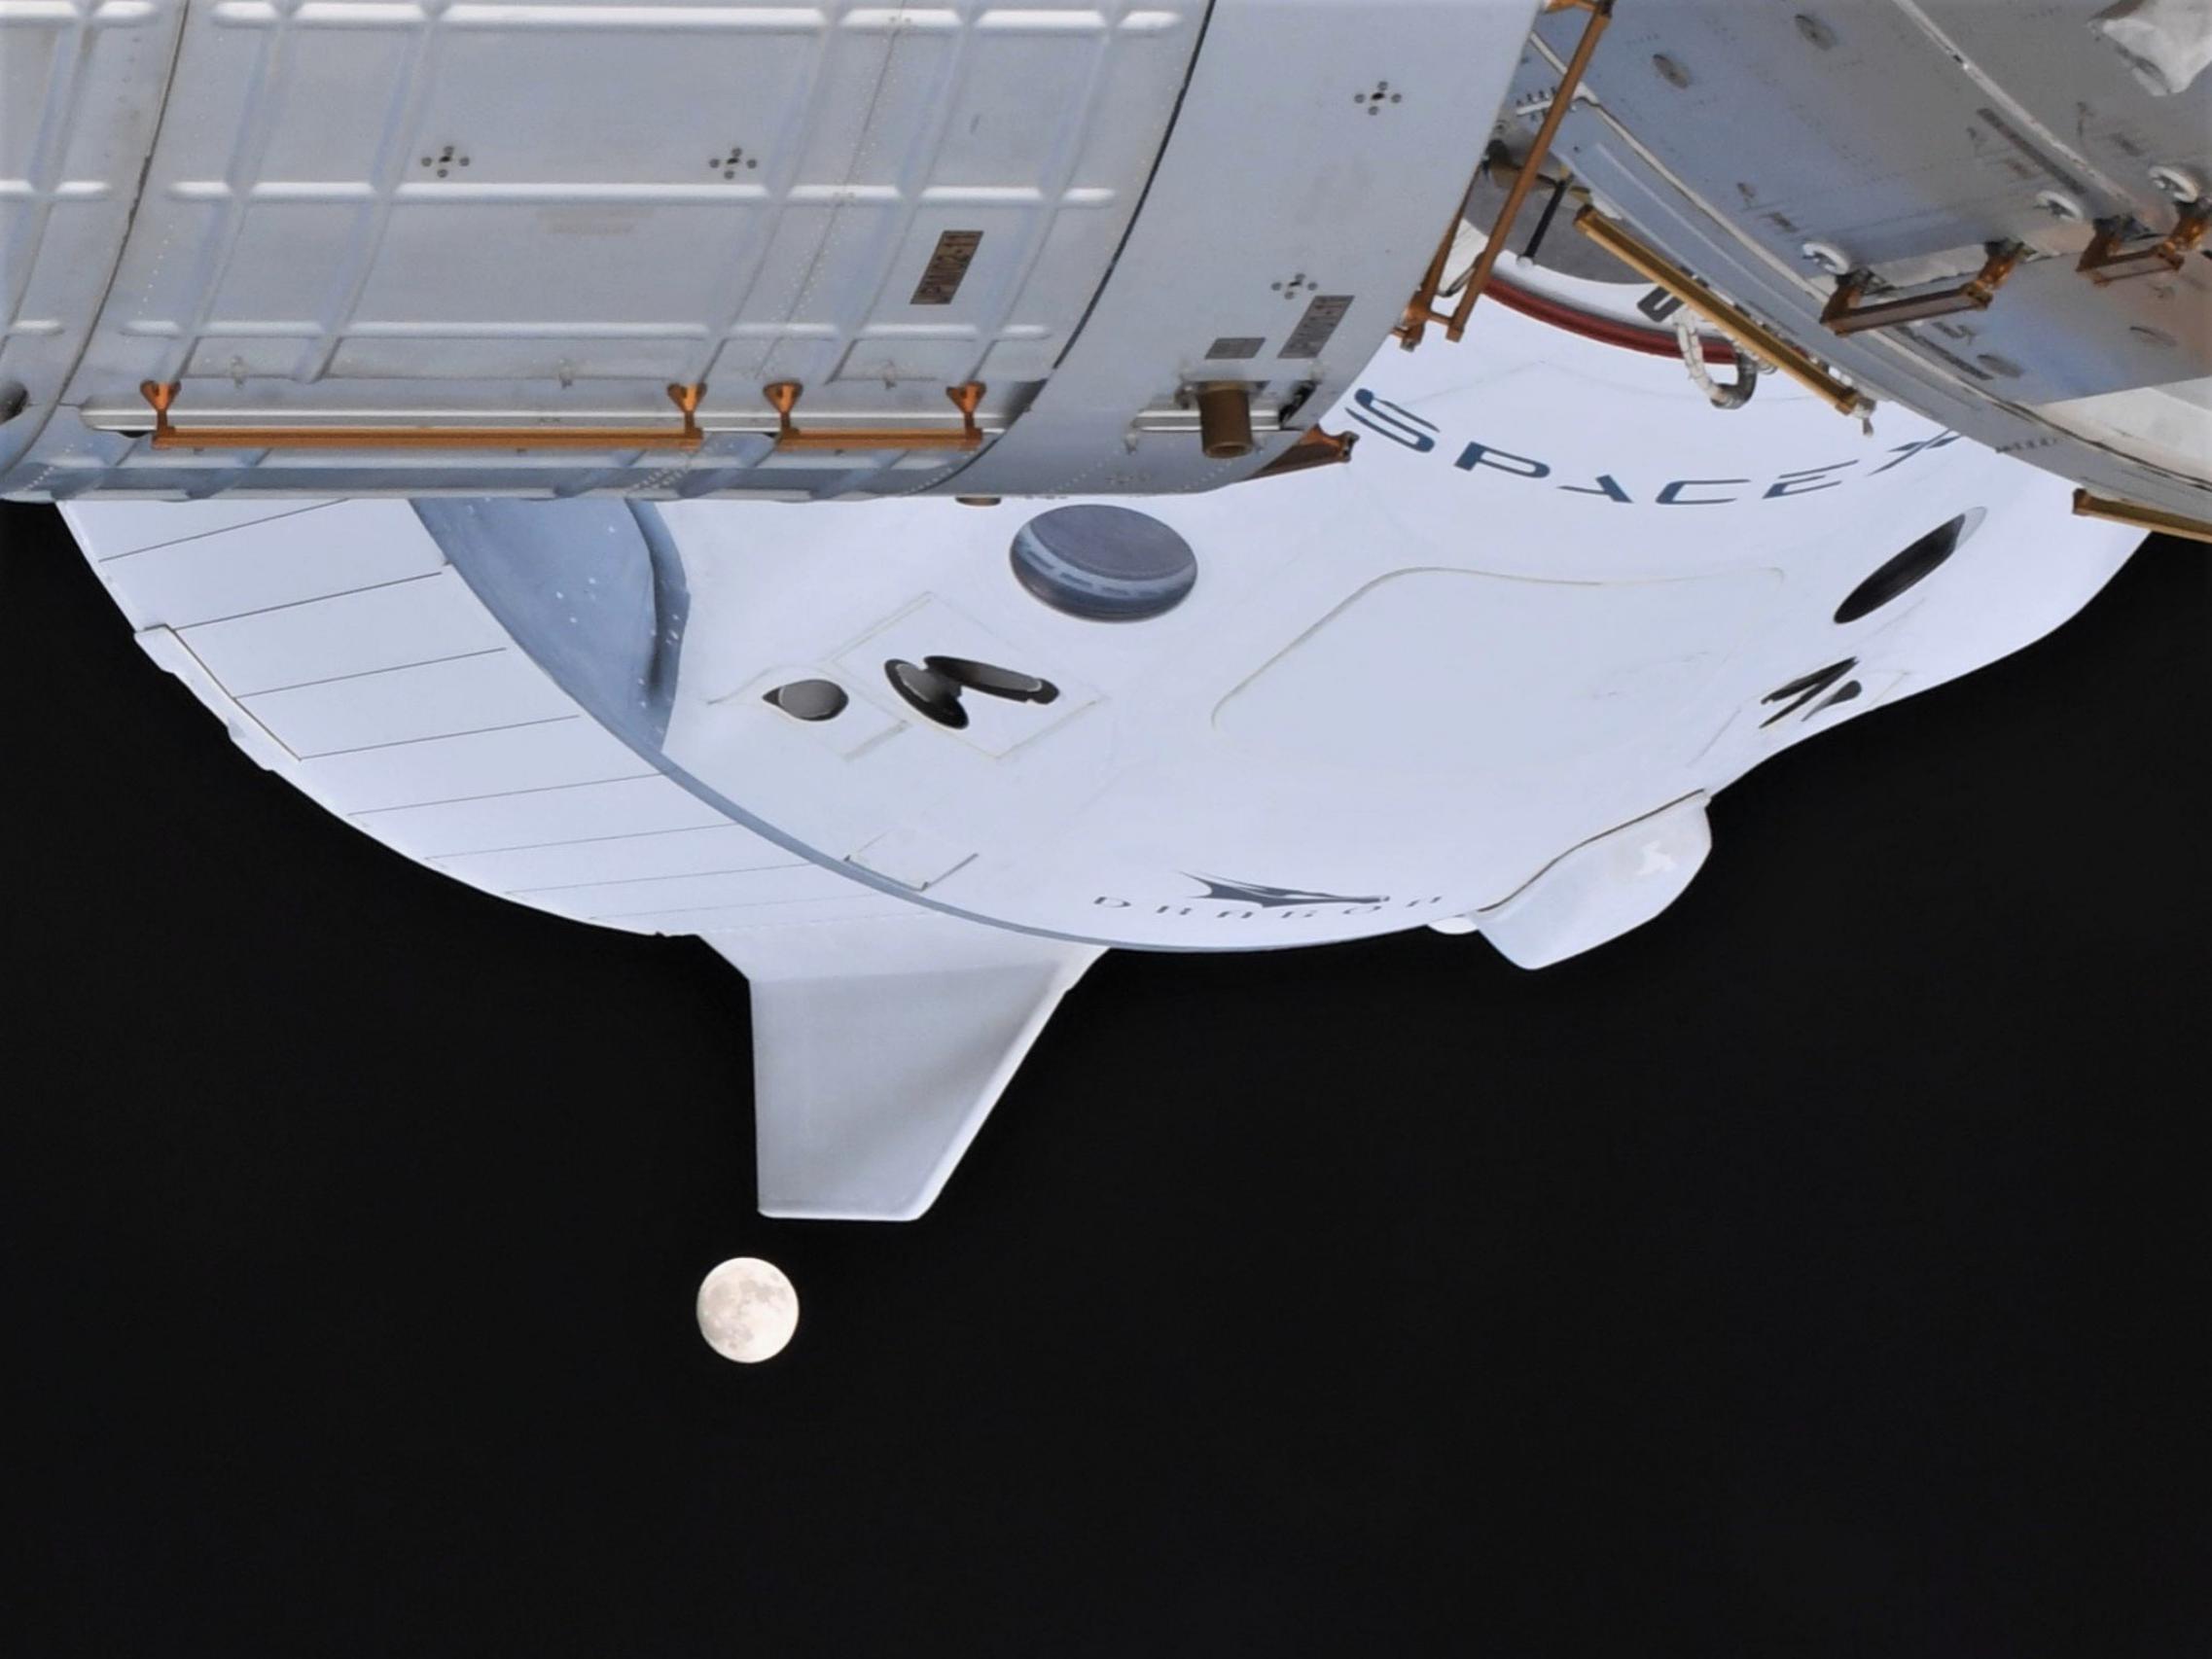 Crew Dragon C207 Crew-1 ISS 112520 (Soichi Noguchi) Moon 7 (c)